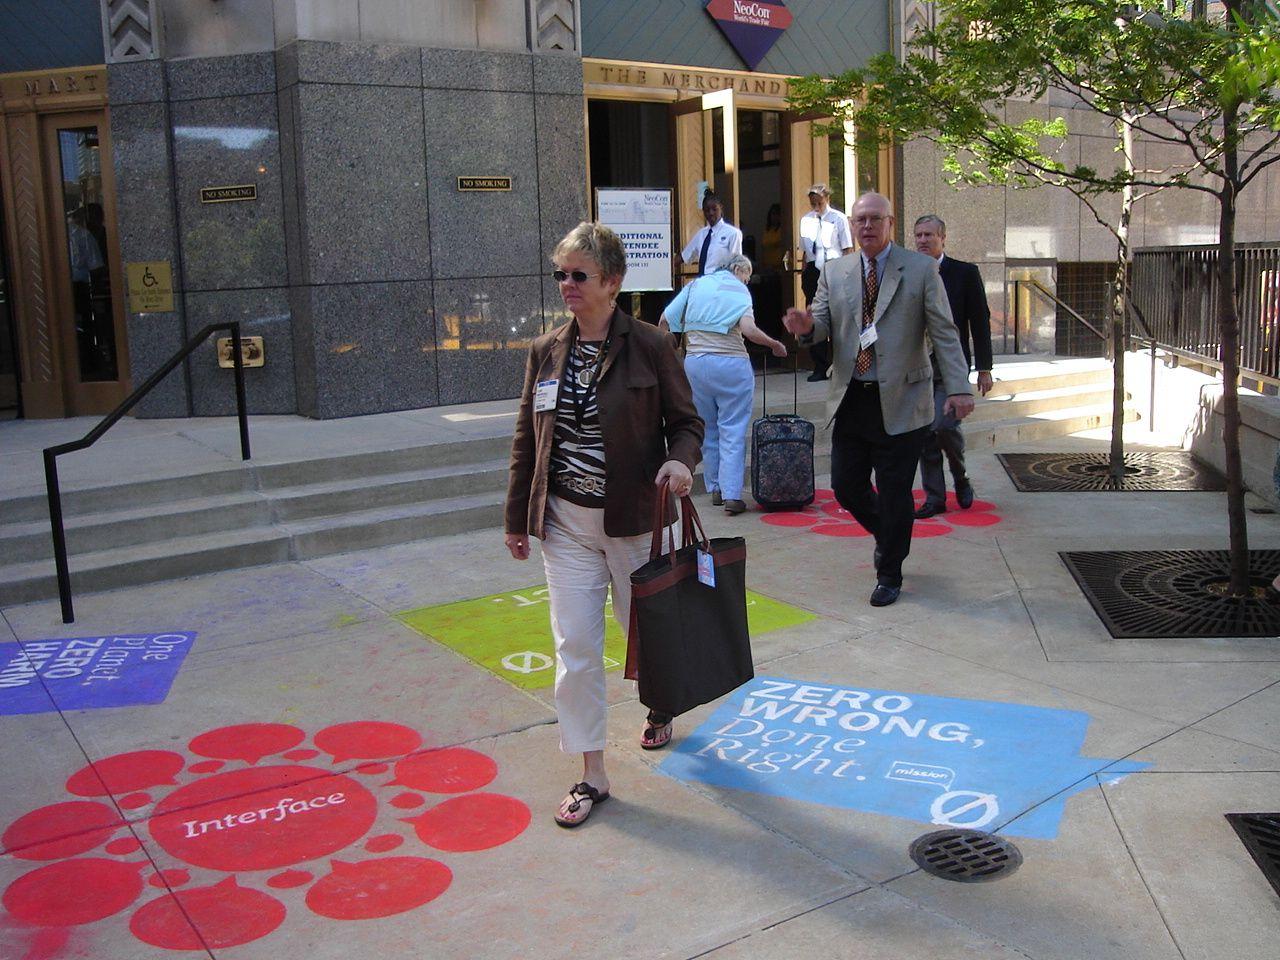 sidewalk advertising ideas